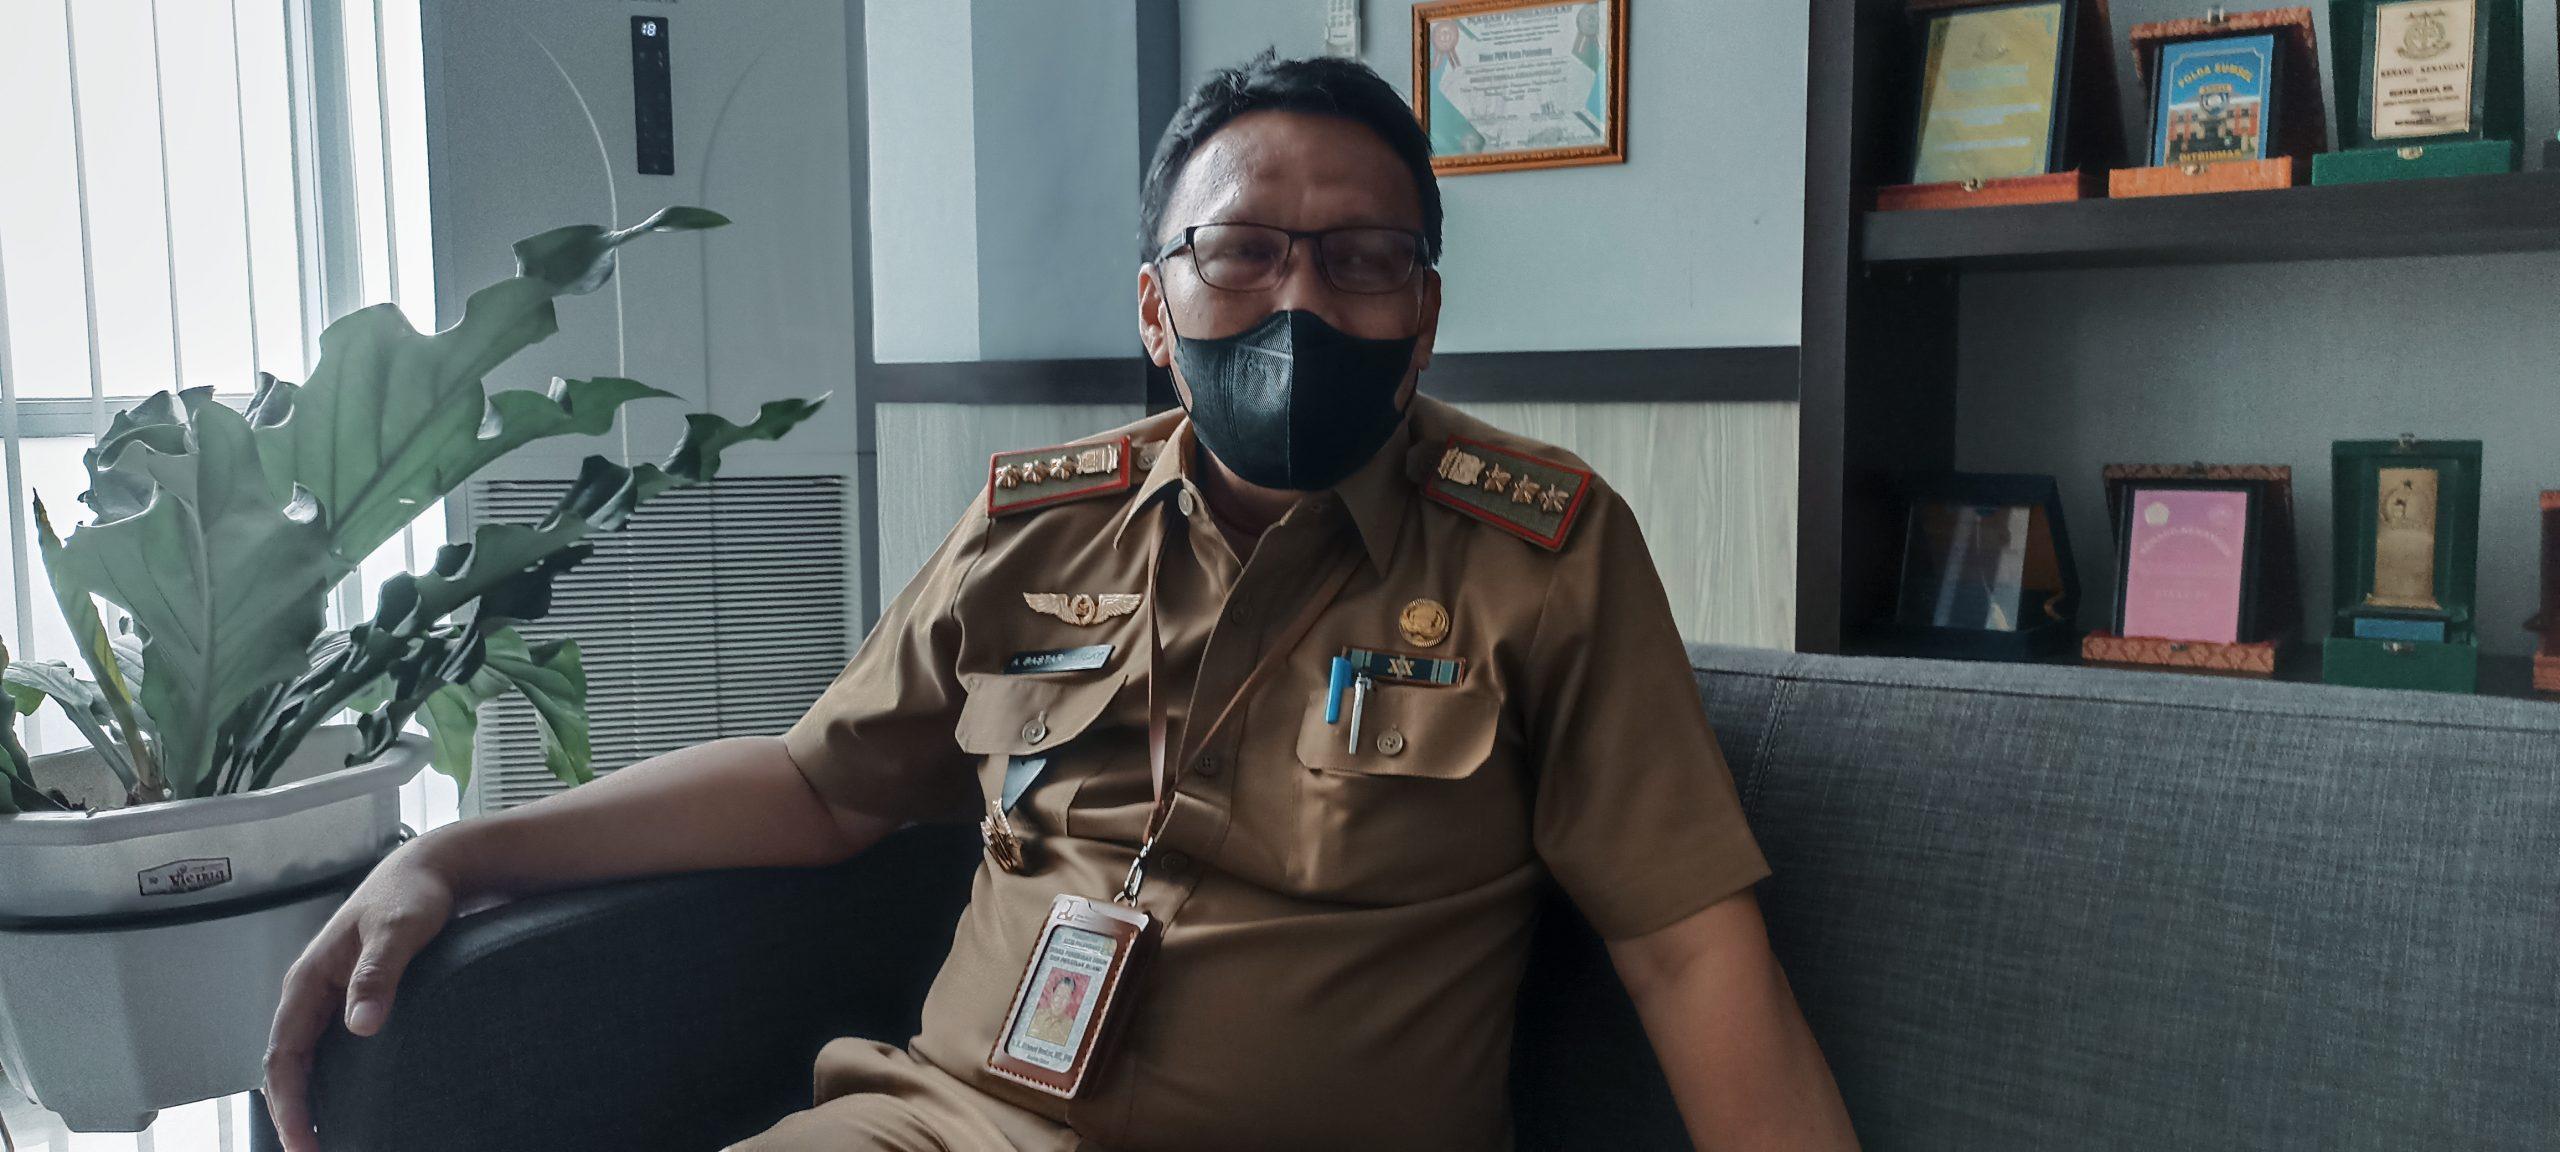 Kepala Dinas PUTR Palembang, Achmad Bastari Yusak saat memberikan keterangan di ruang kerjanya, Senin [27/9]. [Photo: Abror Vandozer]